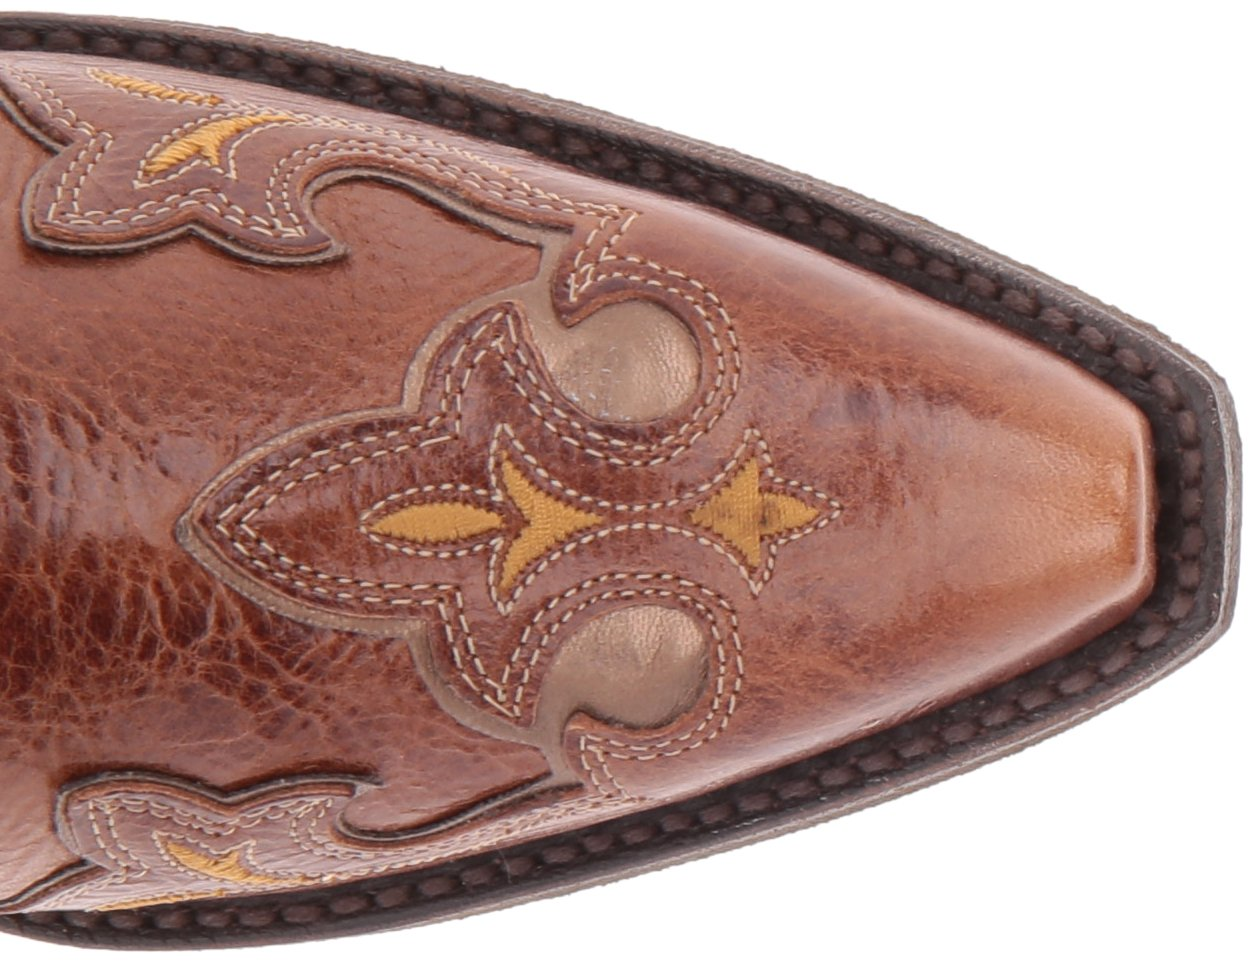 Ariat Boot Women's Zealous Western Cowboy Boot Ariat B01L853APC 11 B(M) US Gingersnap ff1cfd